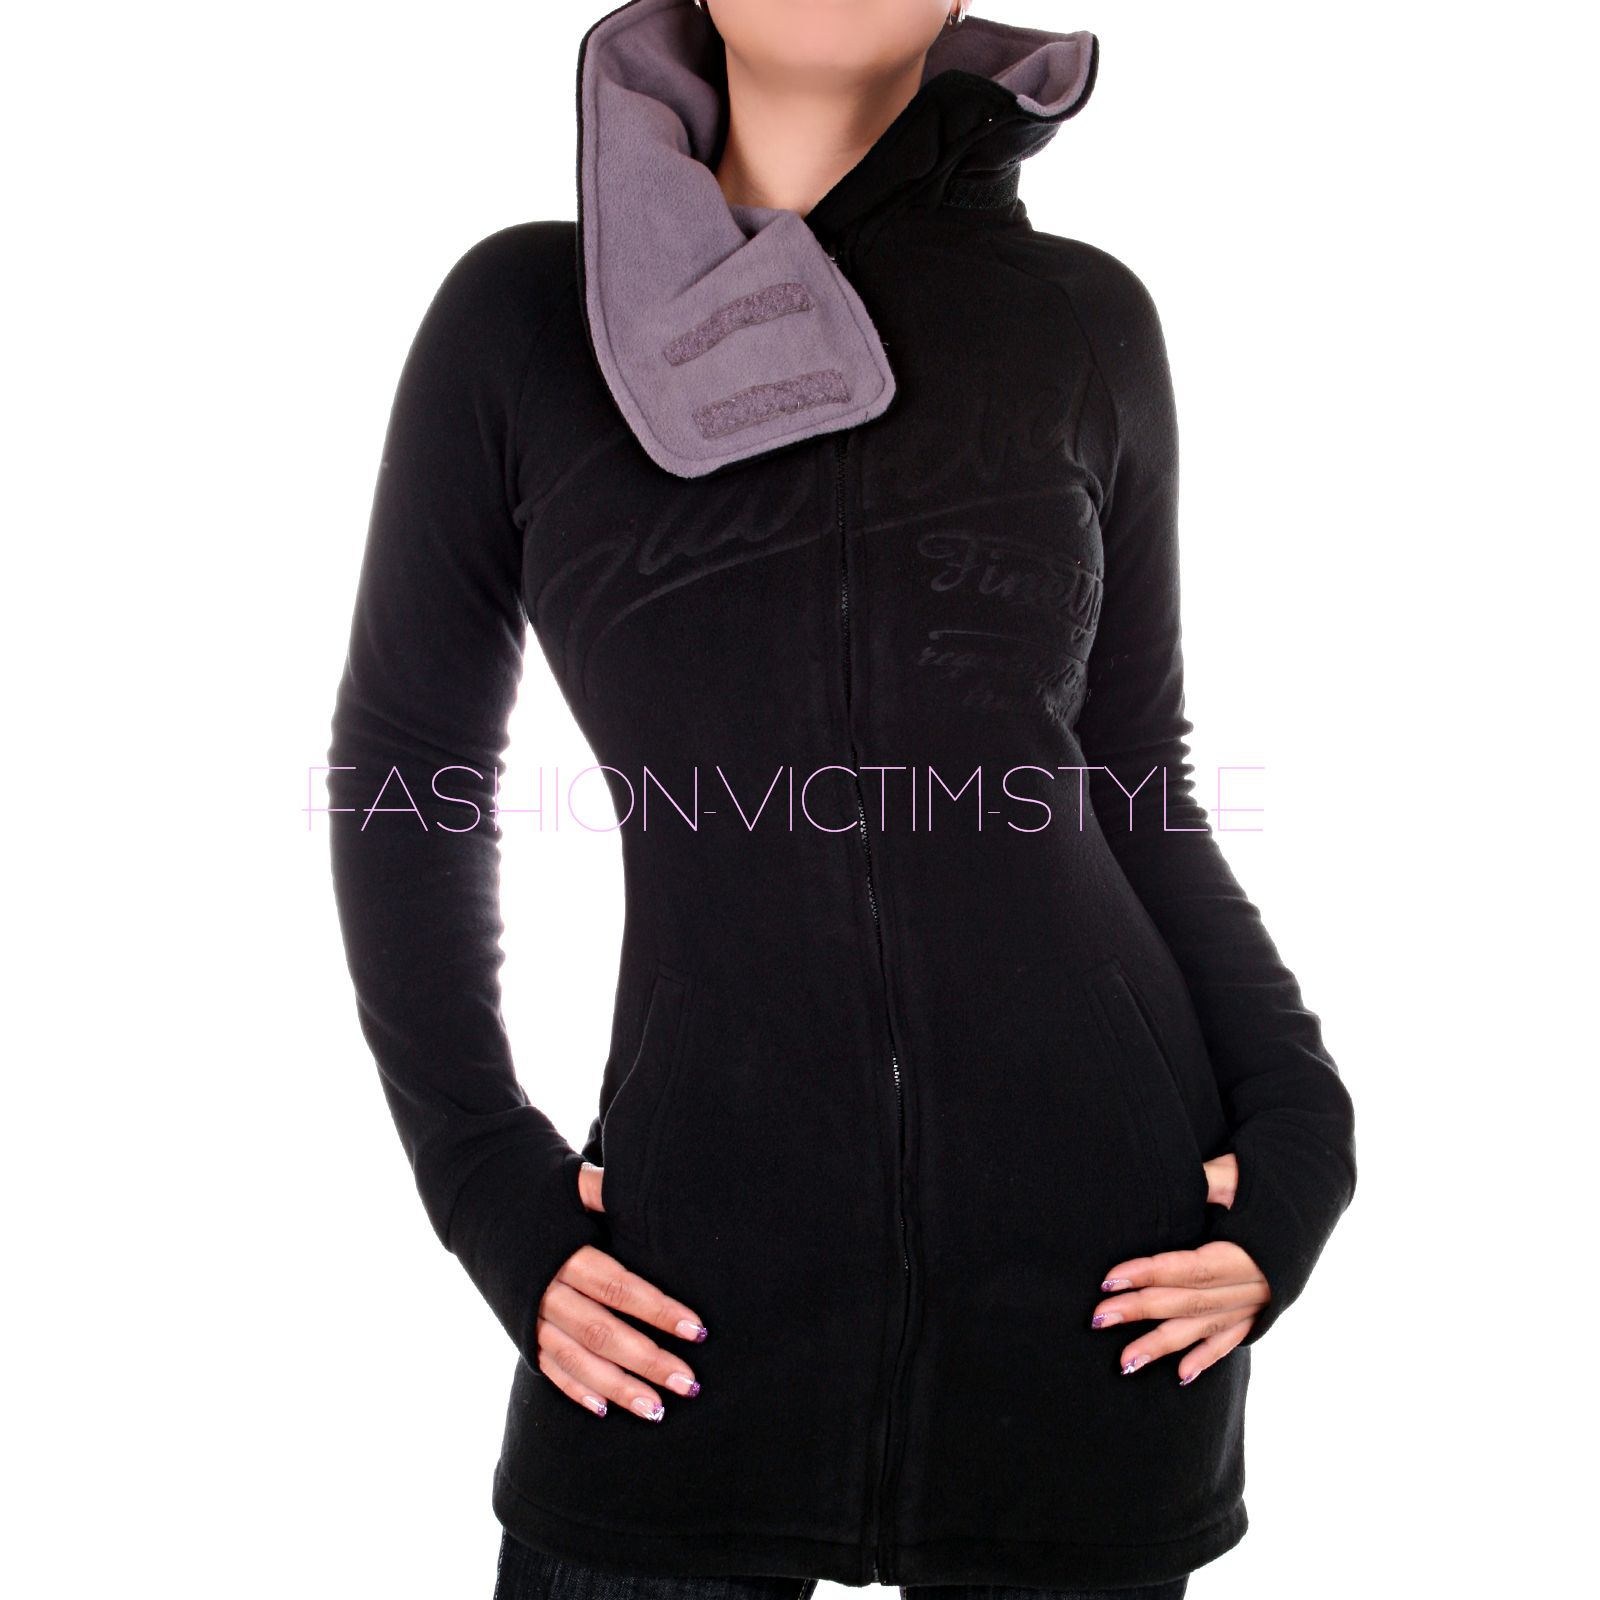 damen fleece jacke pullover fleece mantel sweatjacke lange. Black Bedroom Furniture Sets. Home Design Ideas